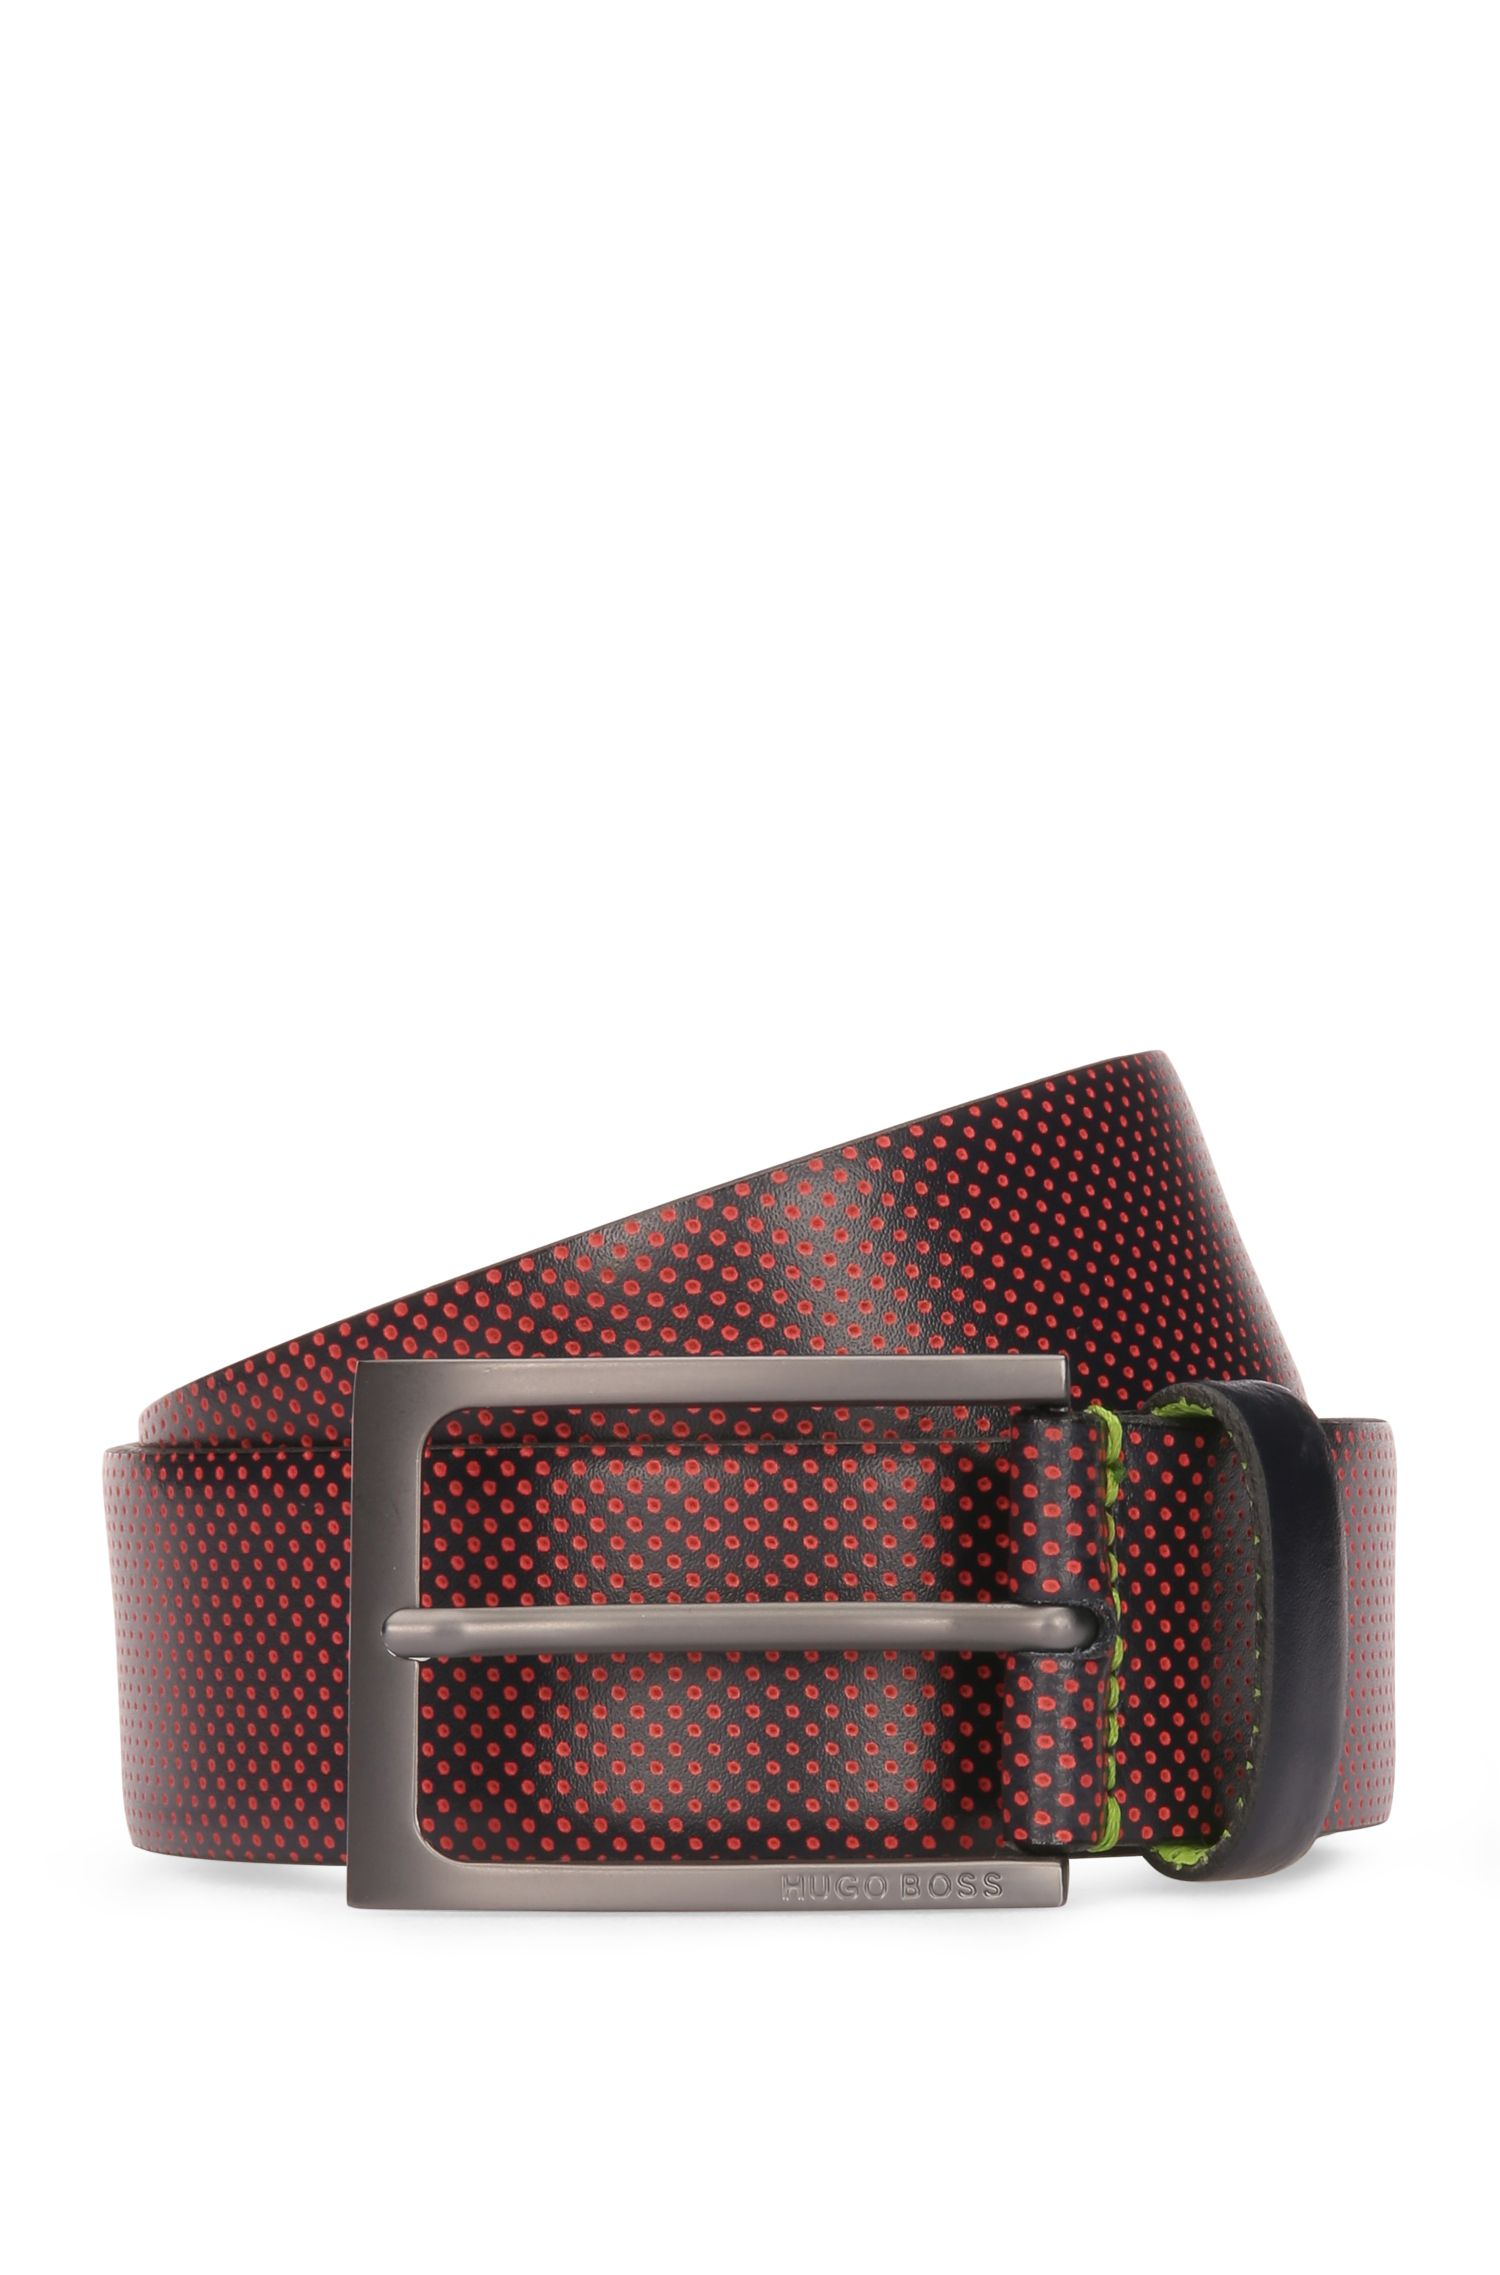 Cintura in pelle con trafori a contrasto